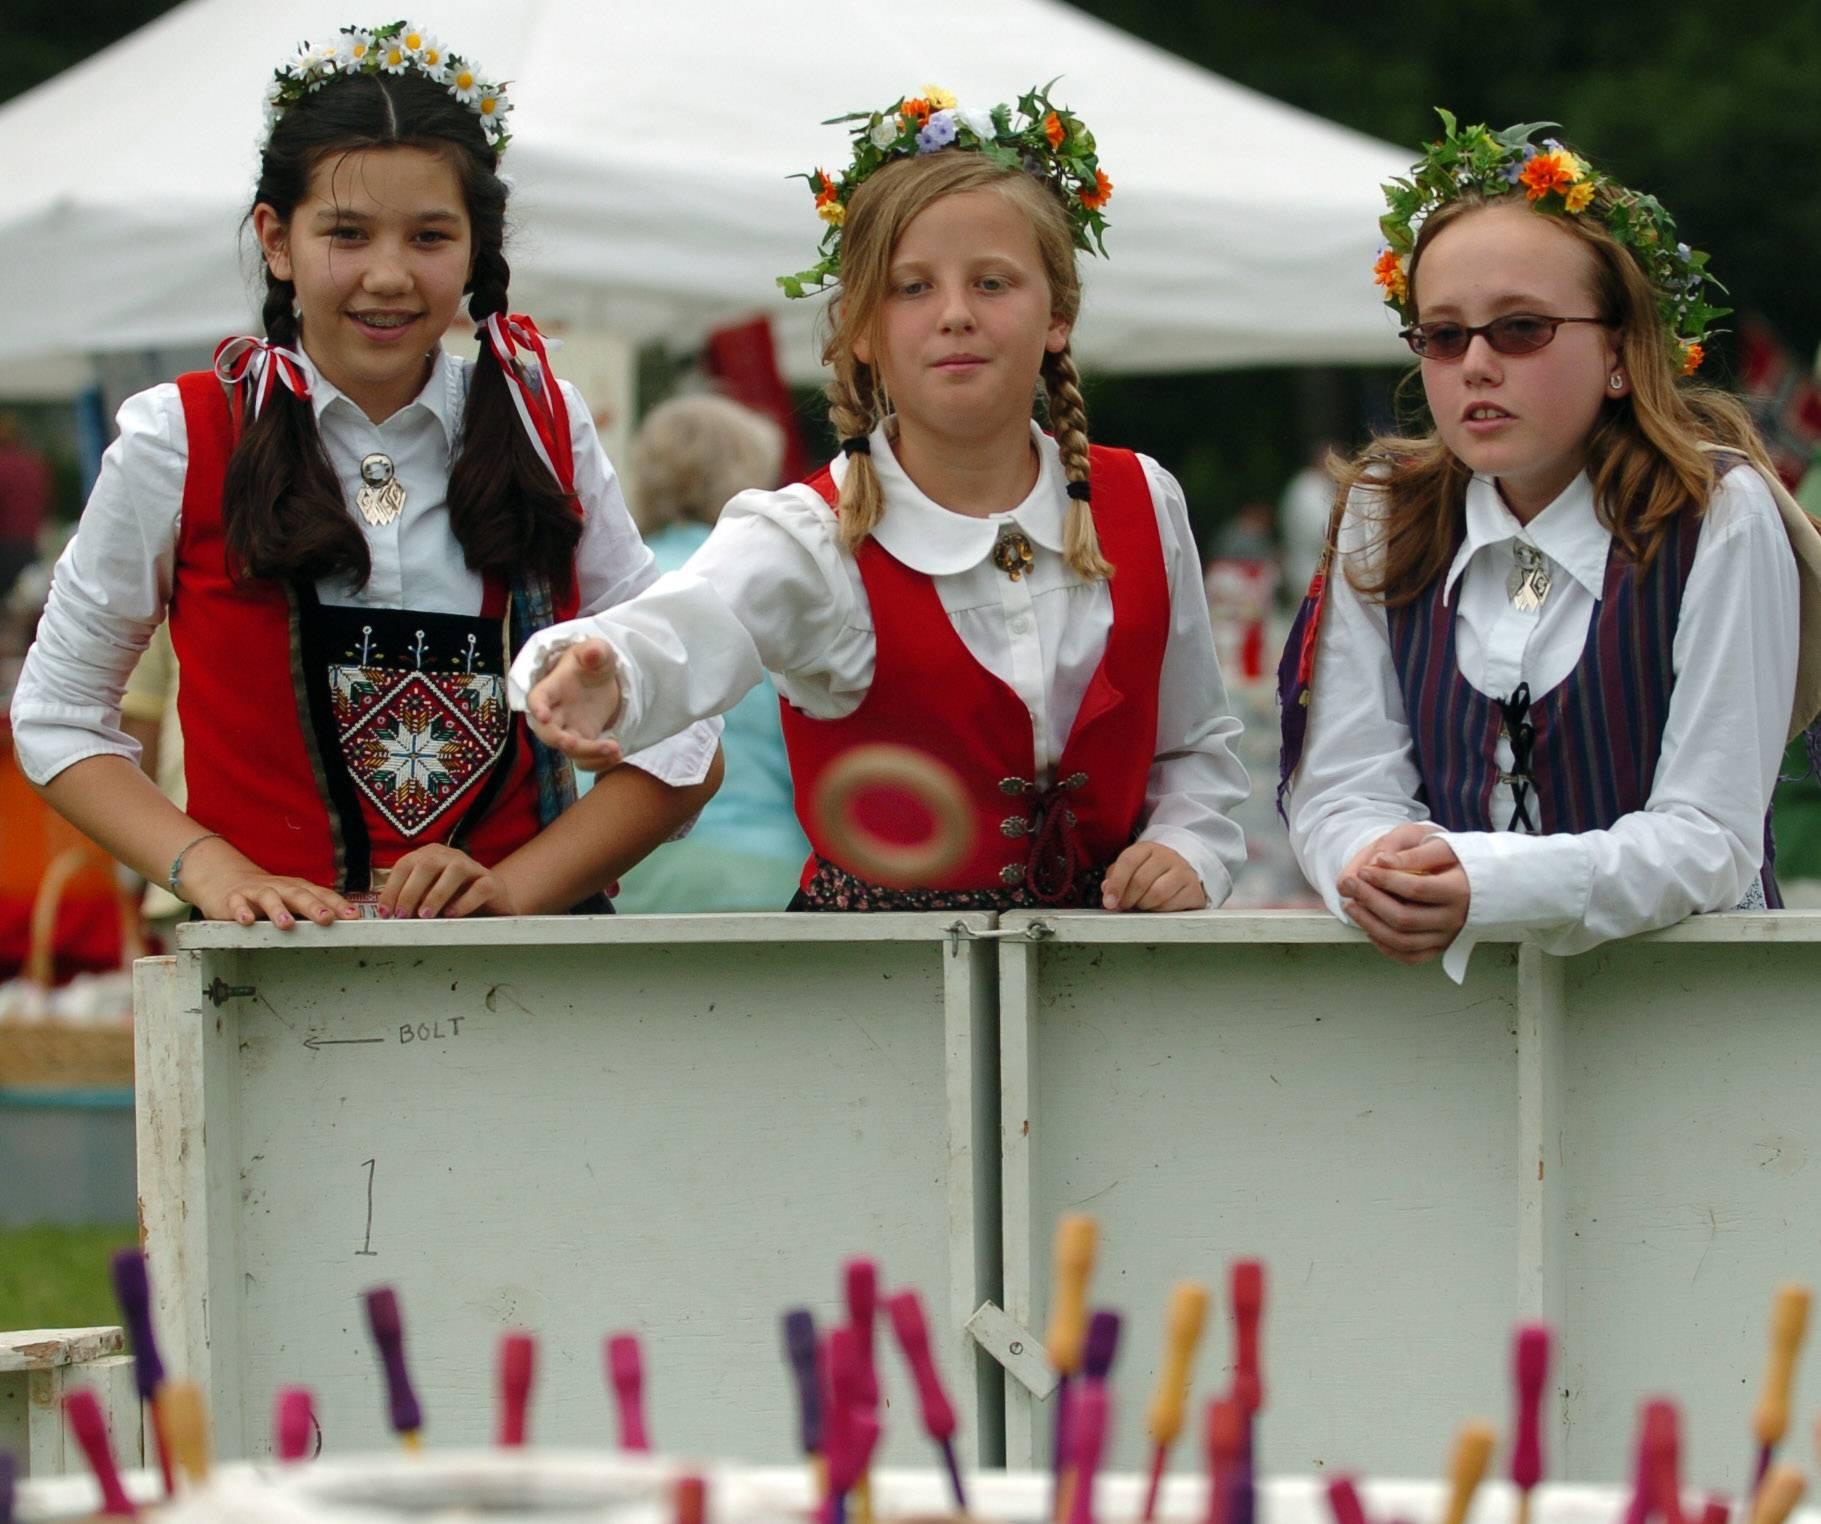 Weekend picks: Celebrate Swedish Days in Geneva